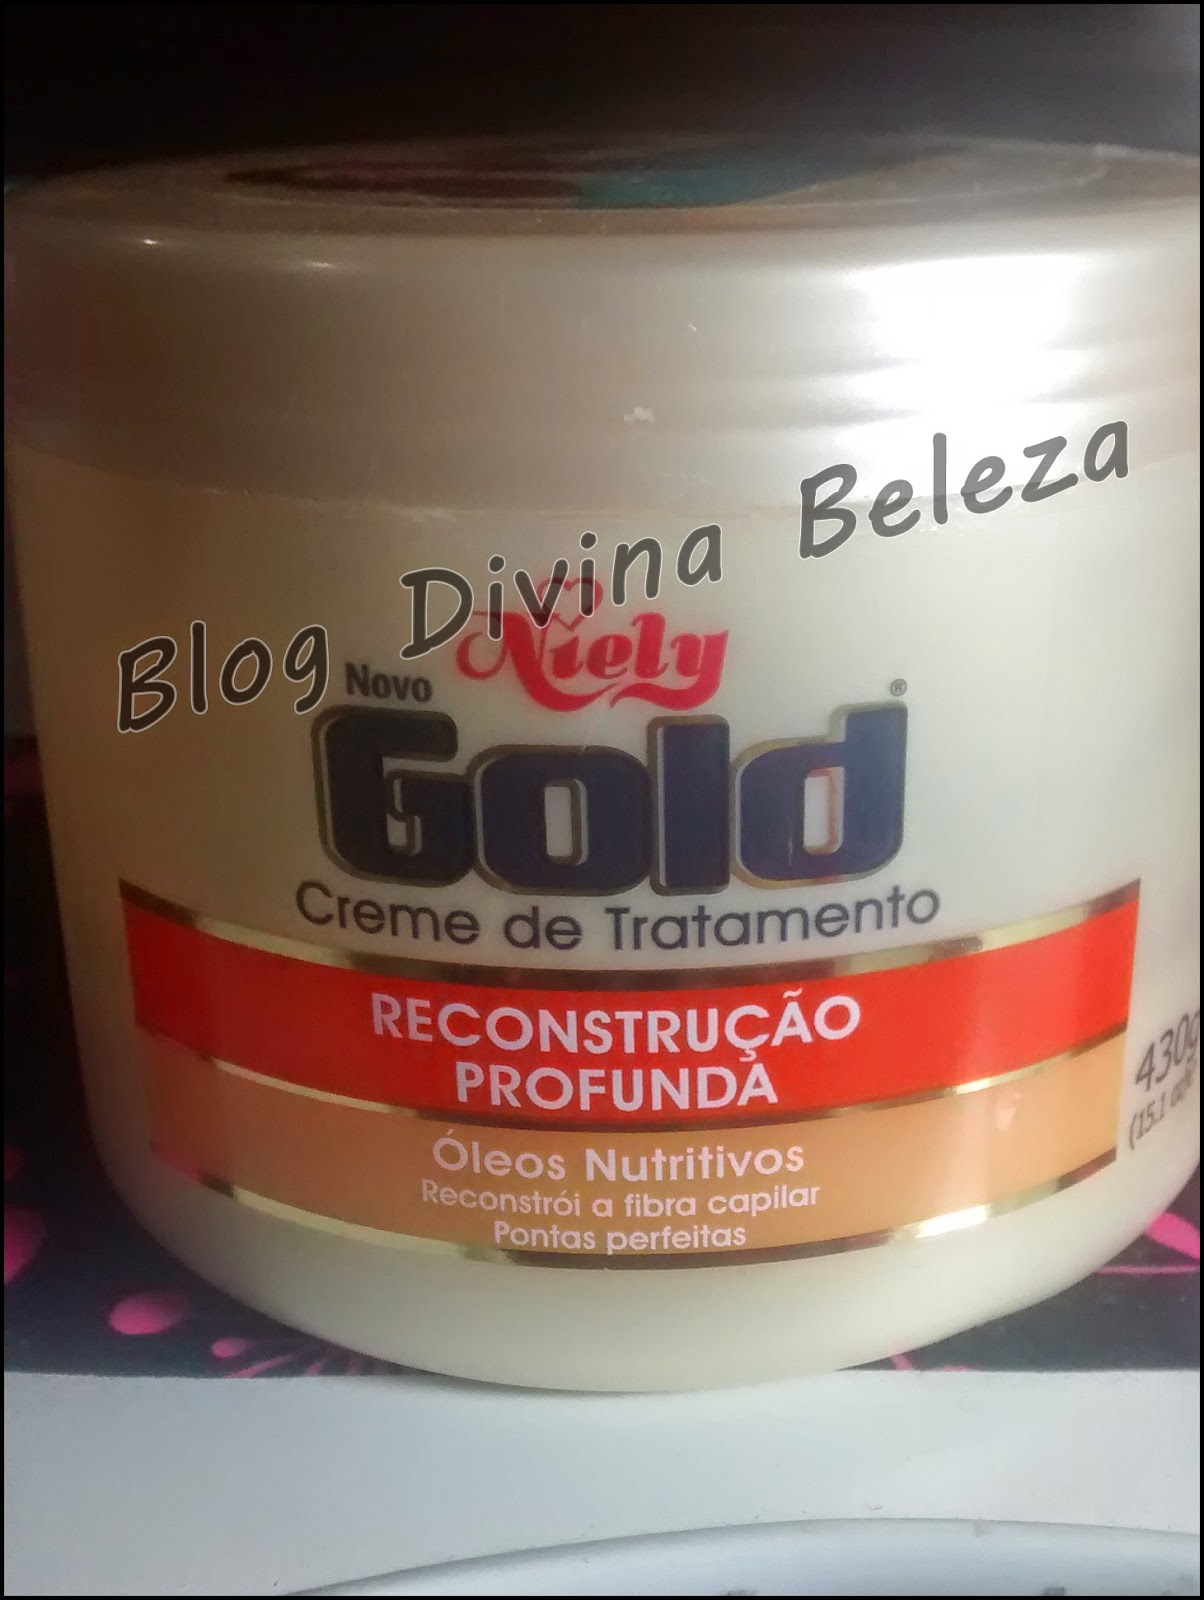 niely gold recontruçao profunda